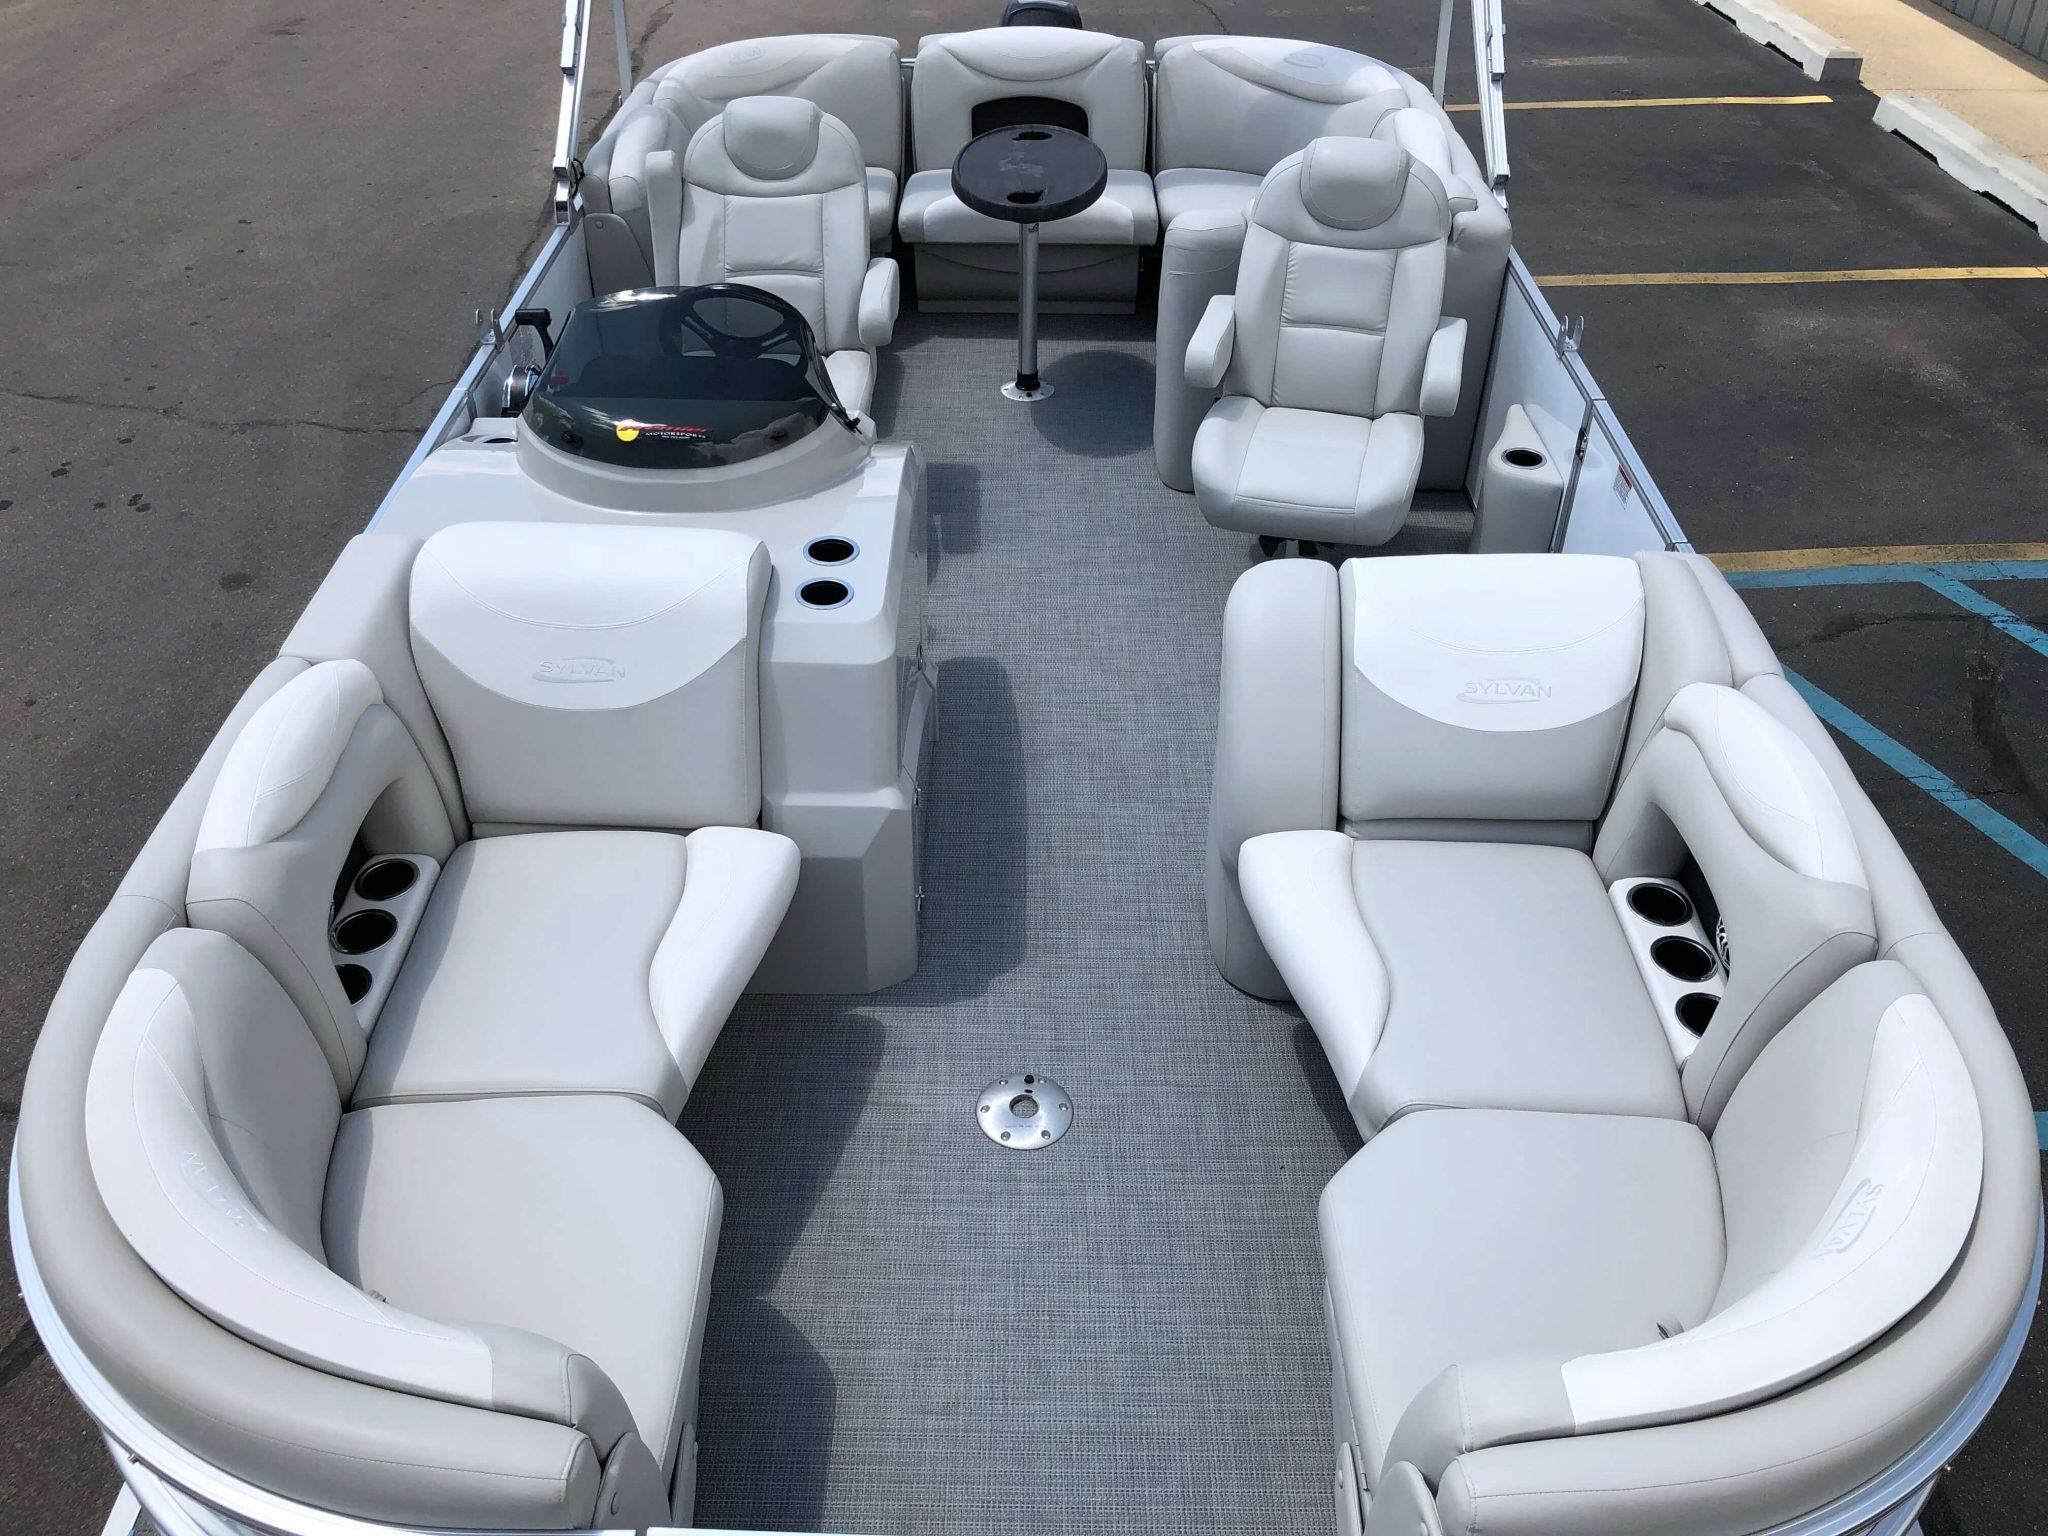 2016 Sylvan 8520 LZ LES Pontoon Boat Layout 1